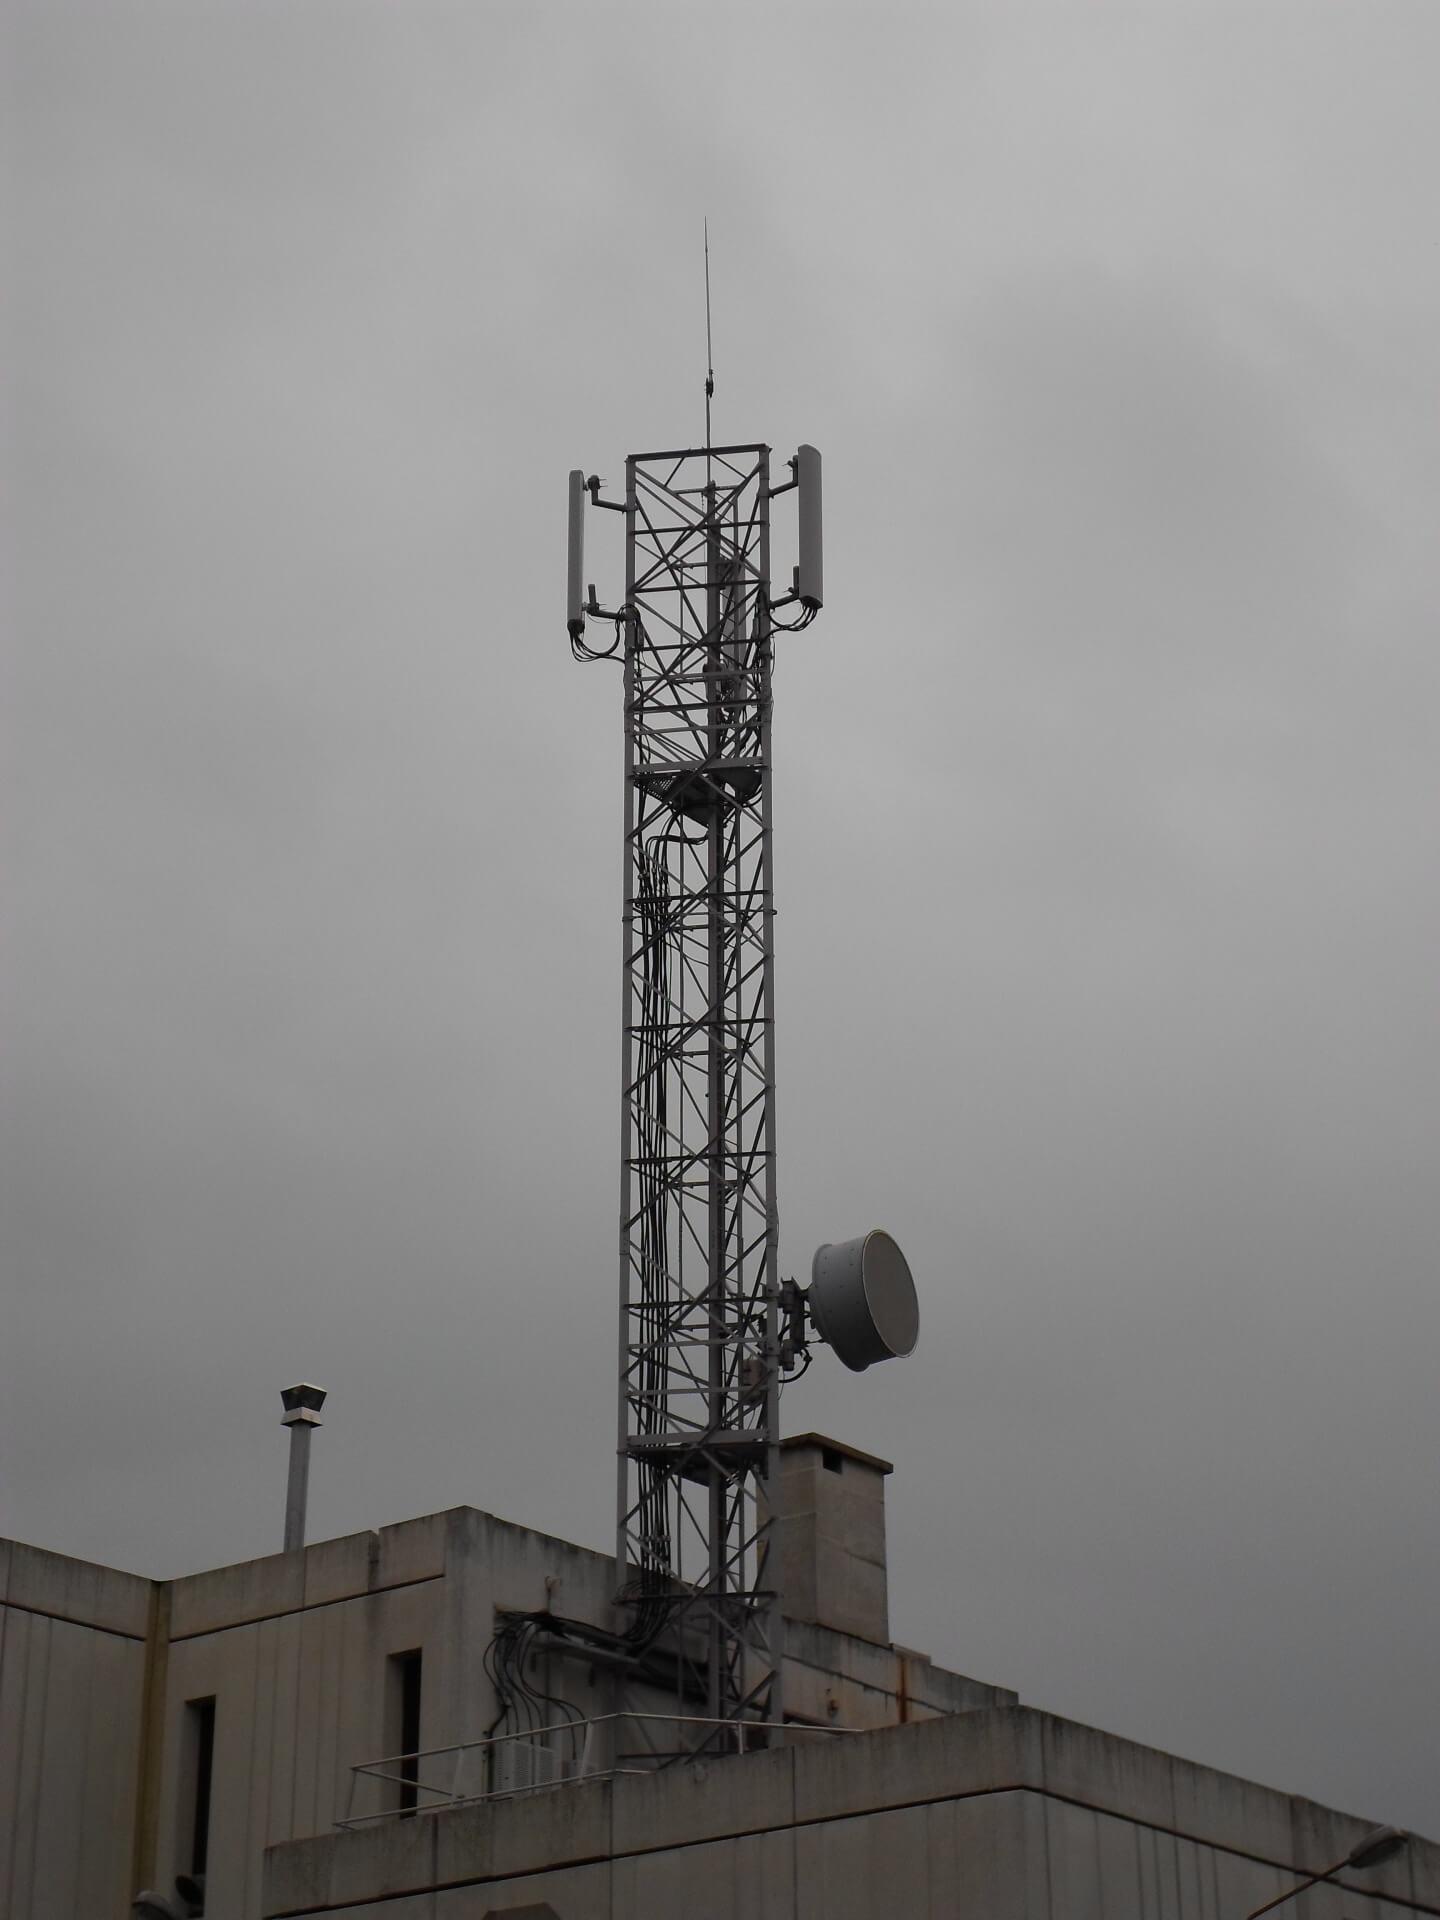 2G Antenne